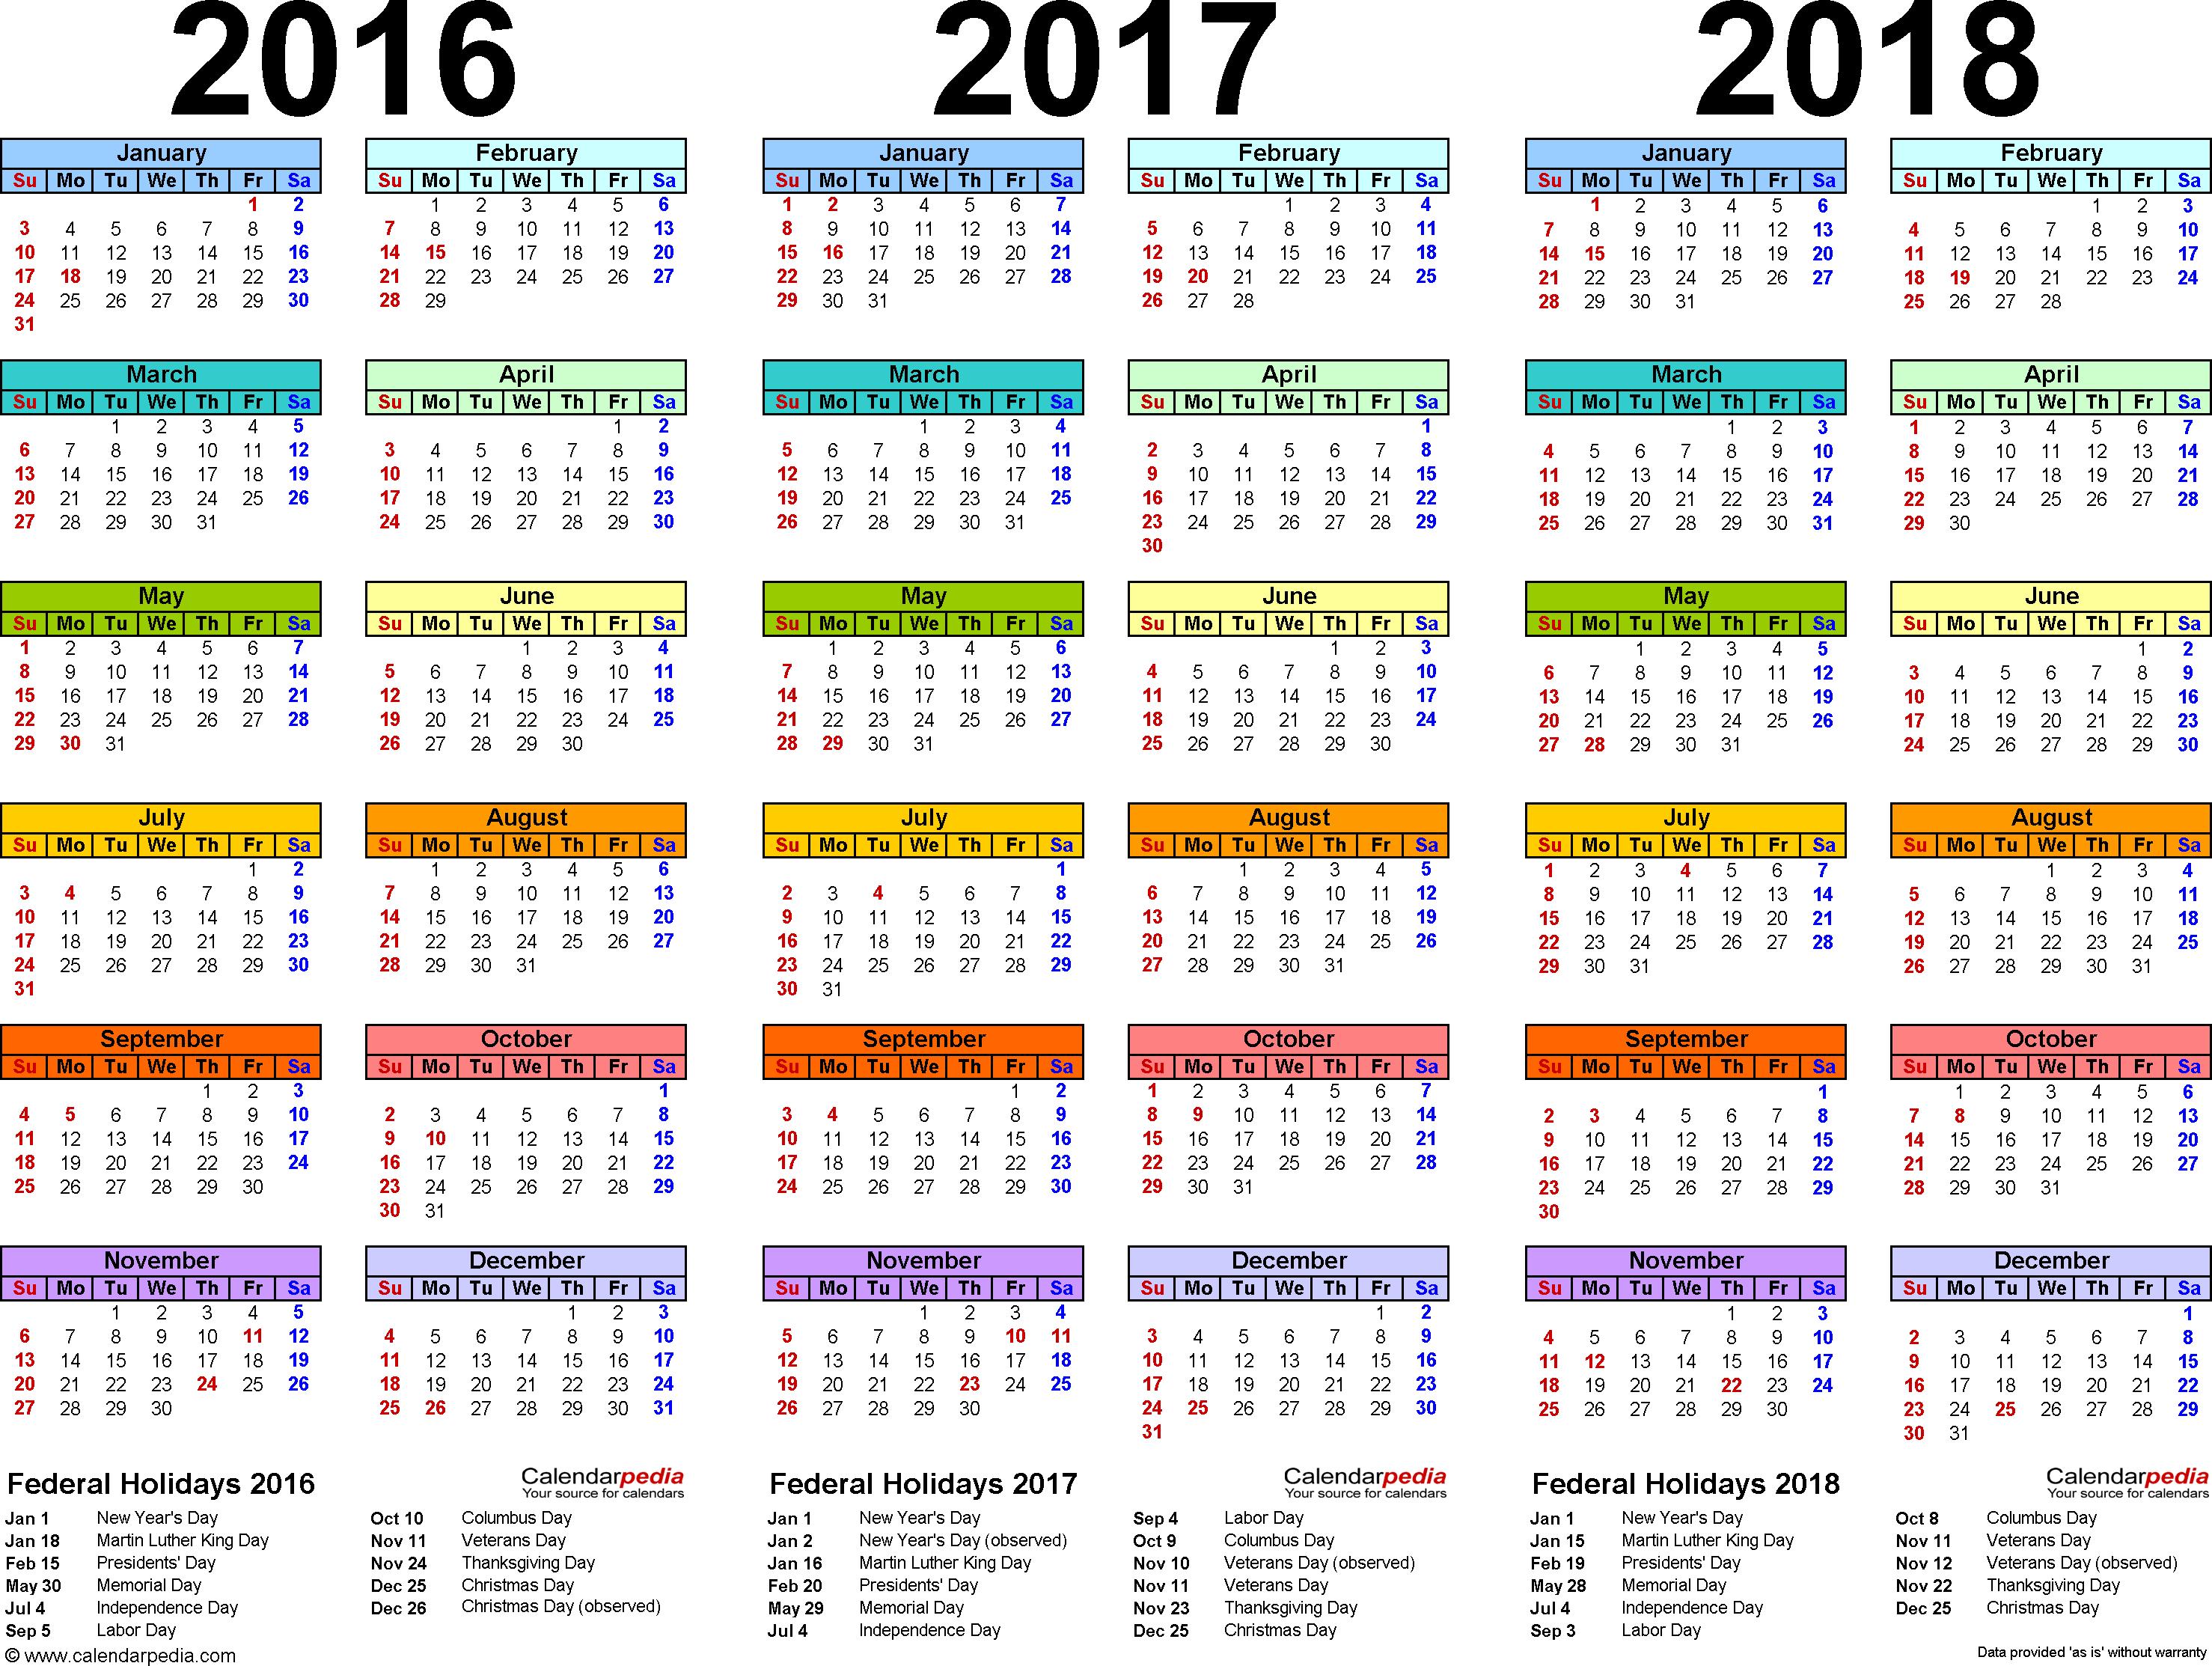 Calendar 2016 2017 2018 Printable